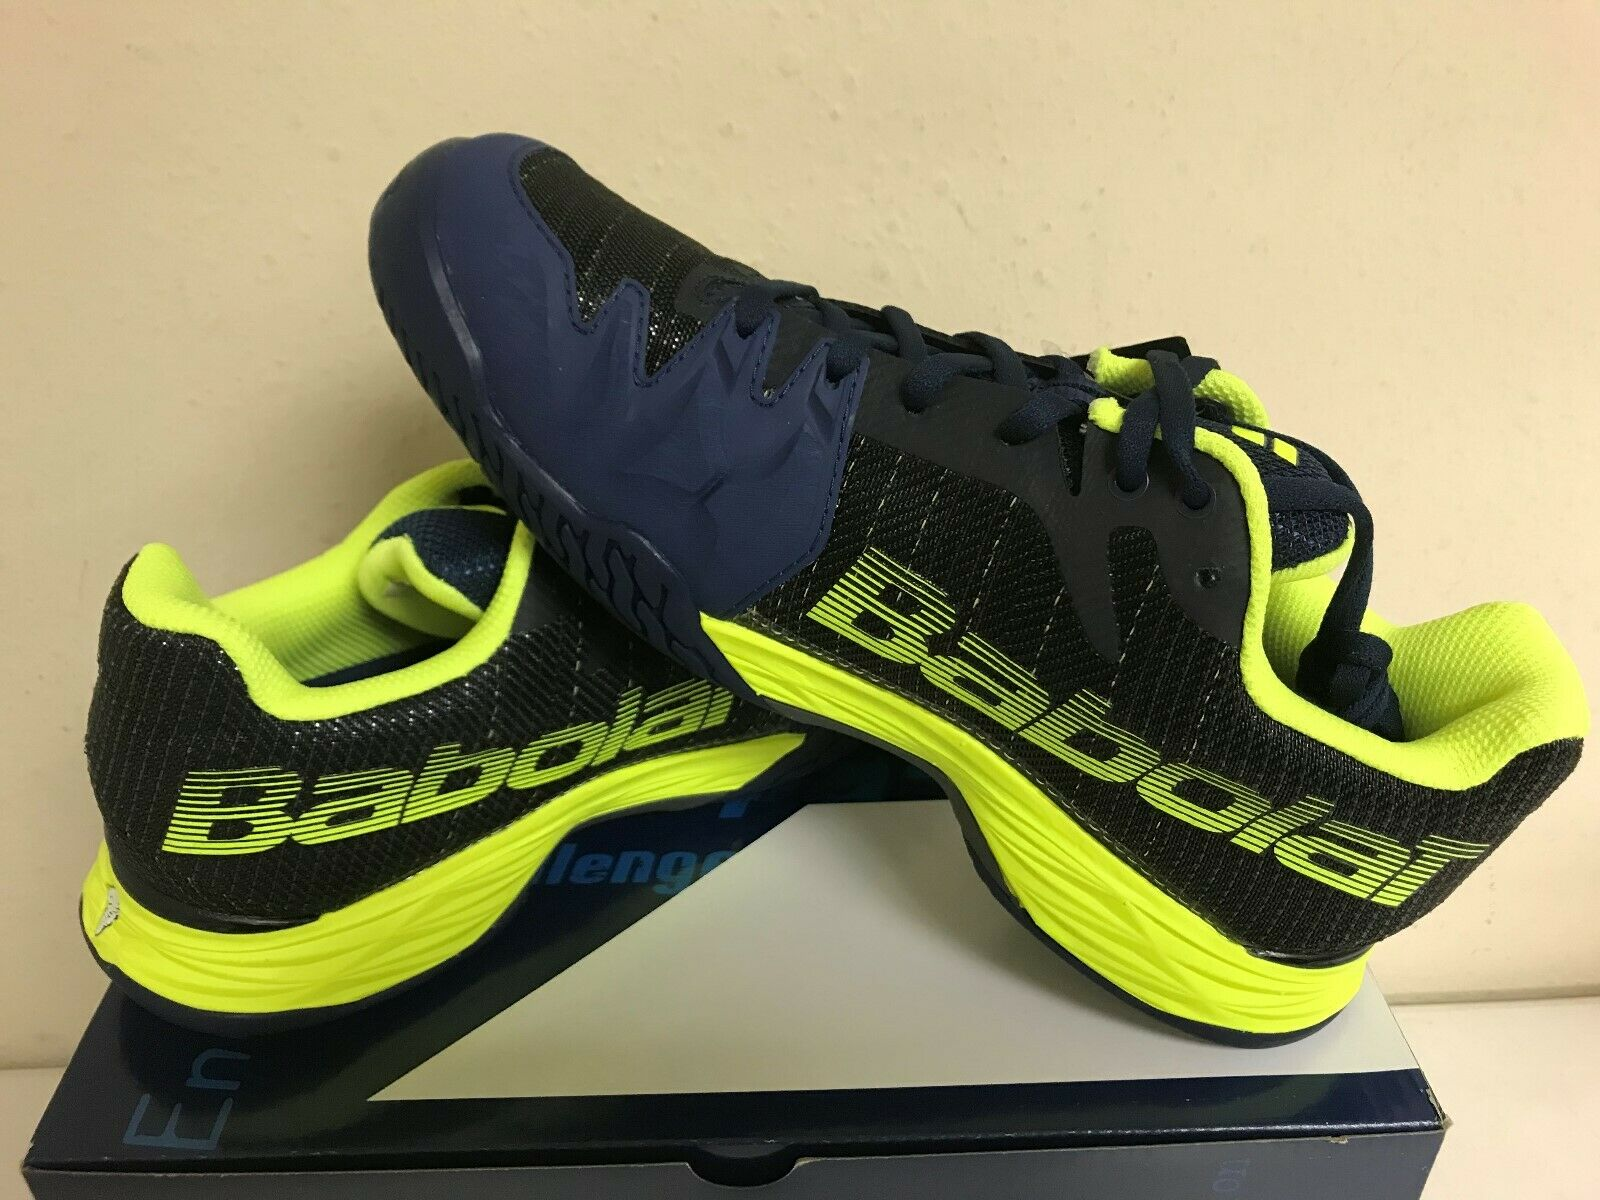 Babolat para hombre Jet Mach II Tribunal Tenis Zapatos todos Azul Amarillo